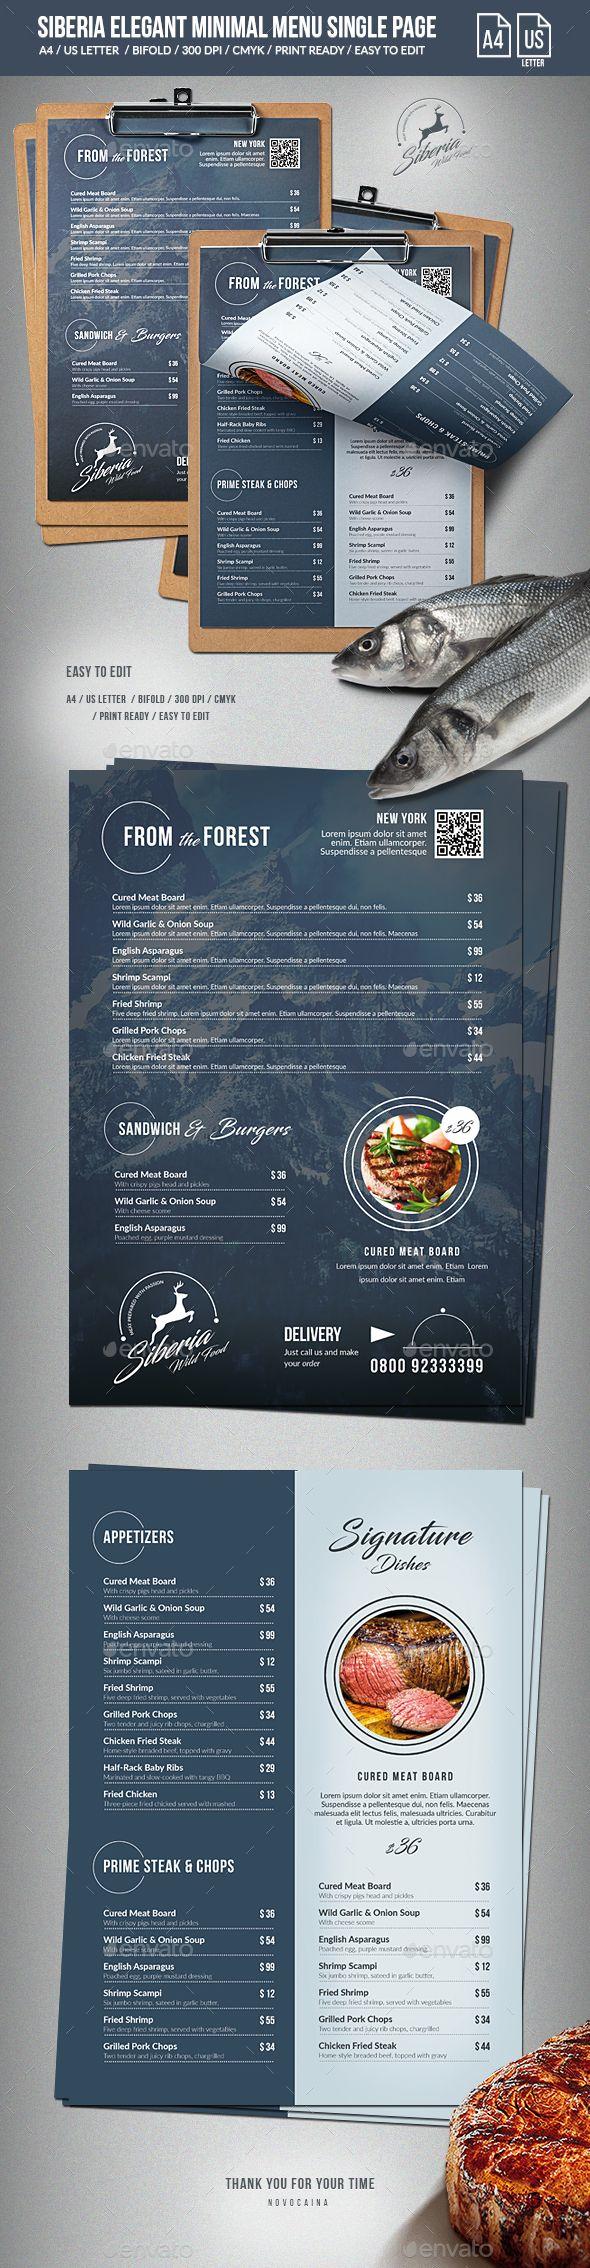 Siberia Elegant Minimal Menu - A4 and US Letter | Bar, Restaurante y ...